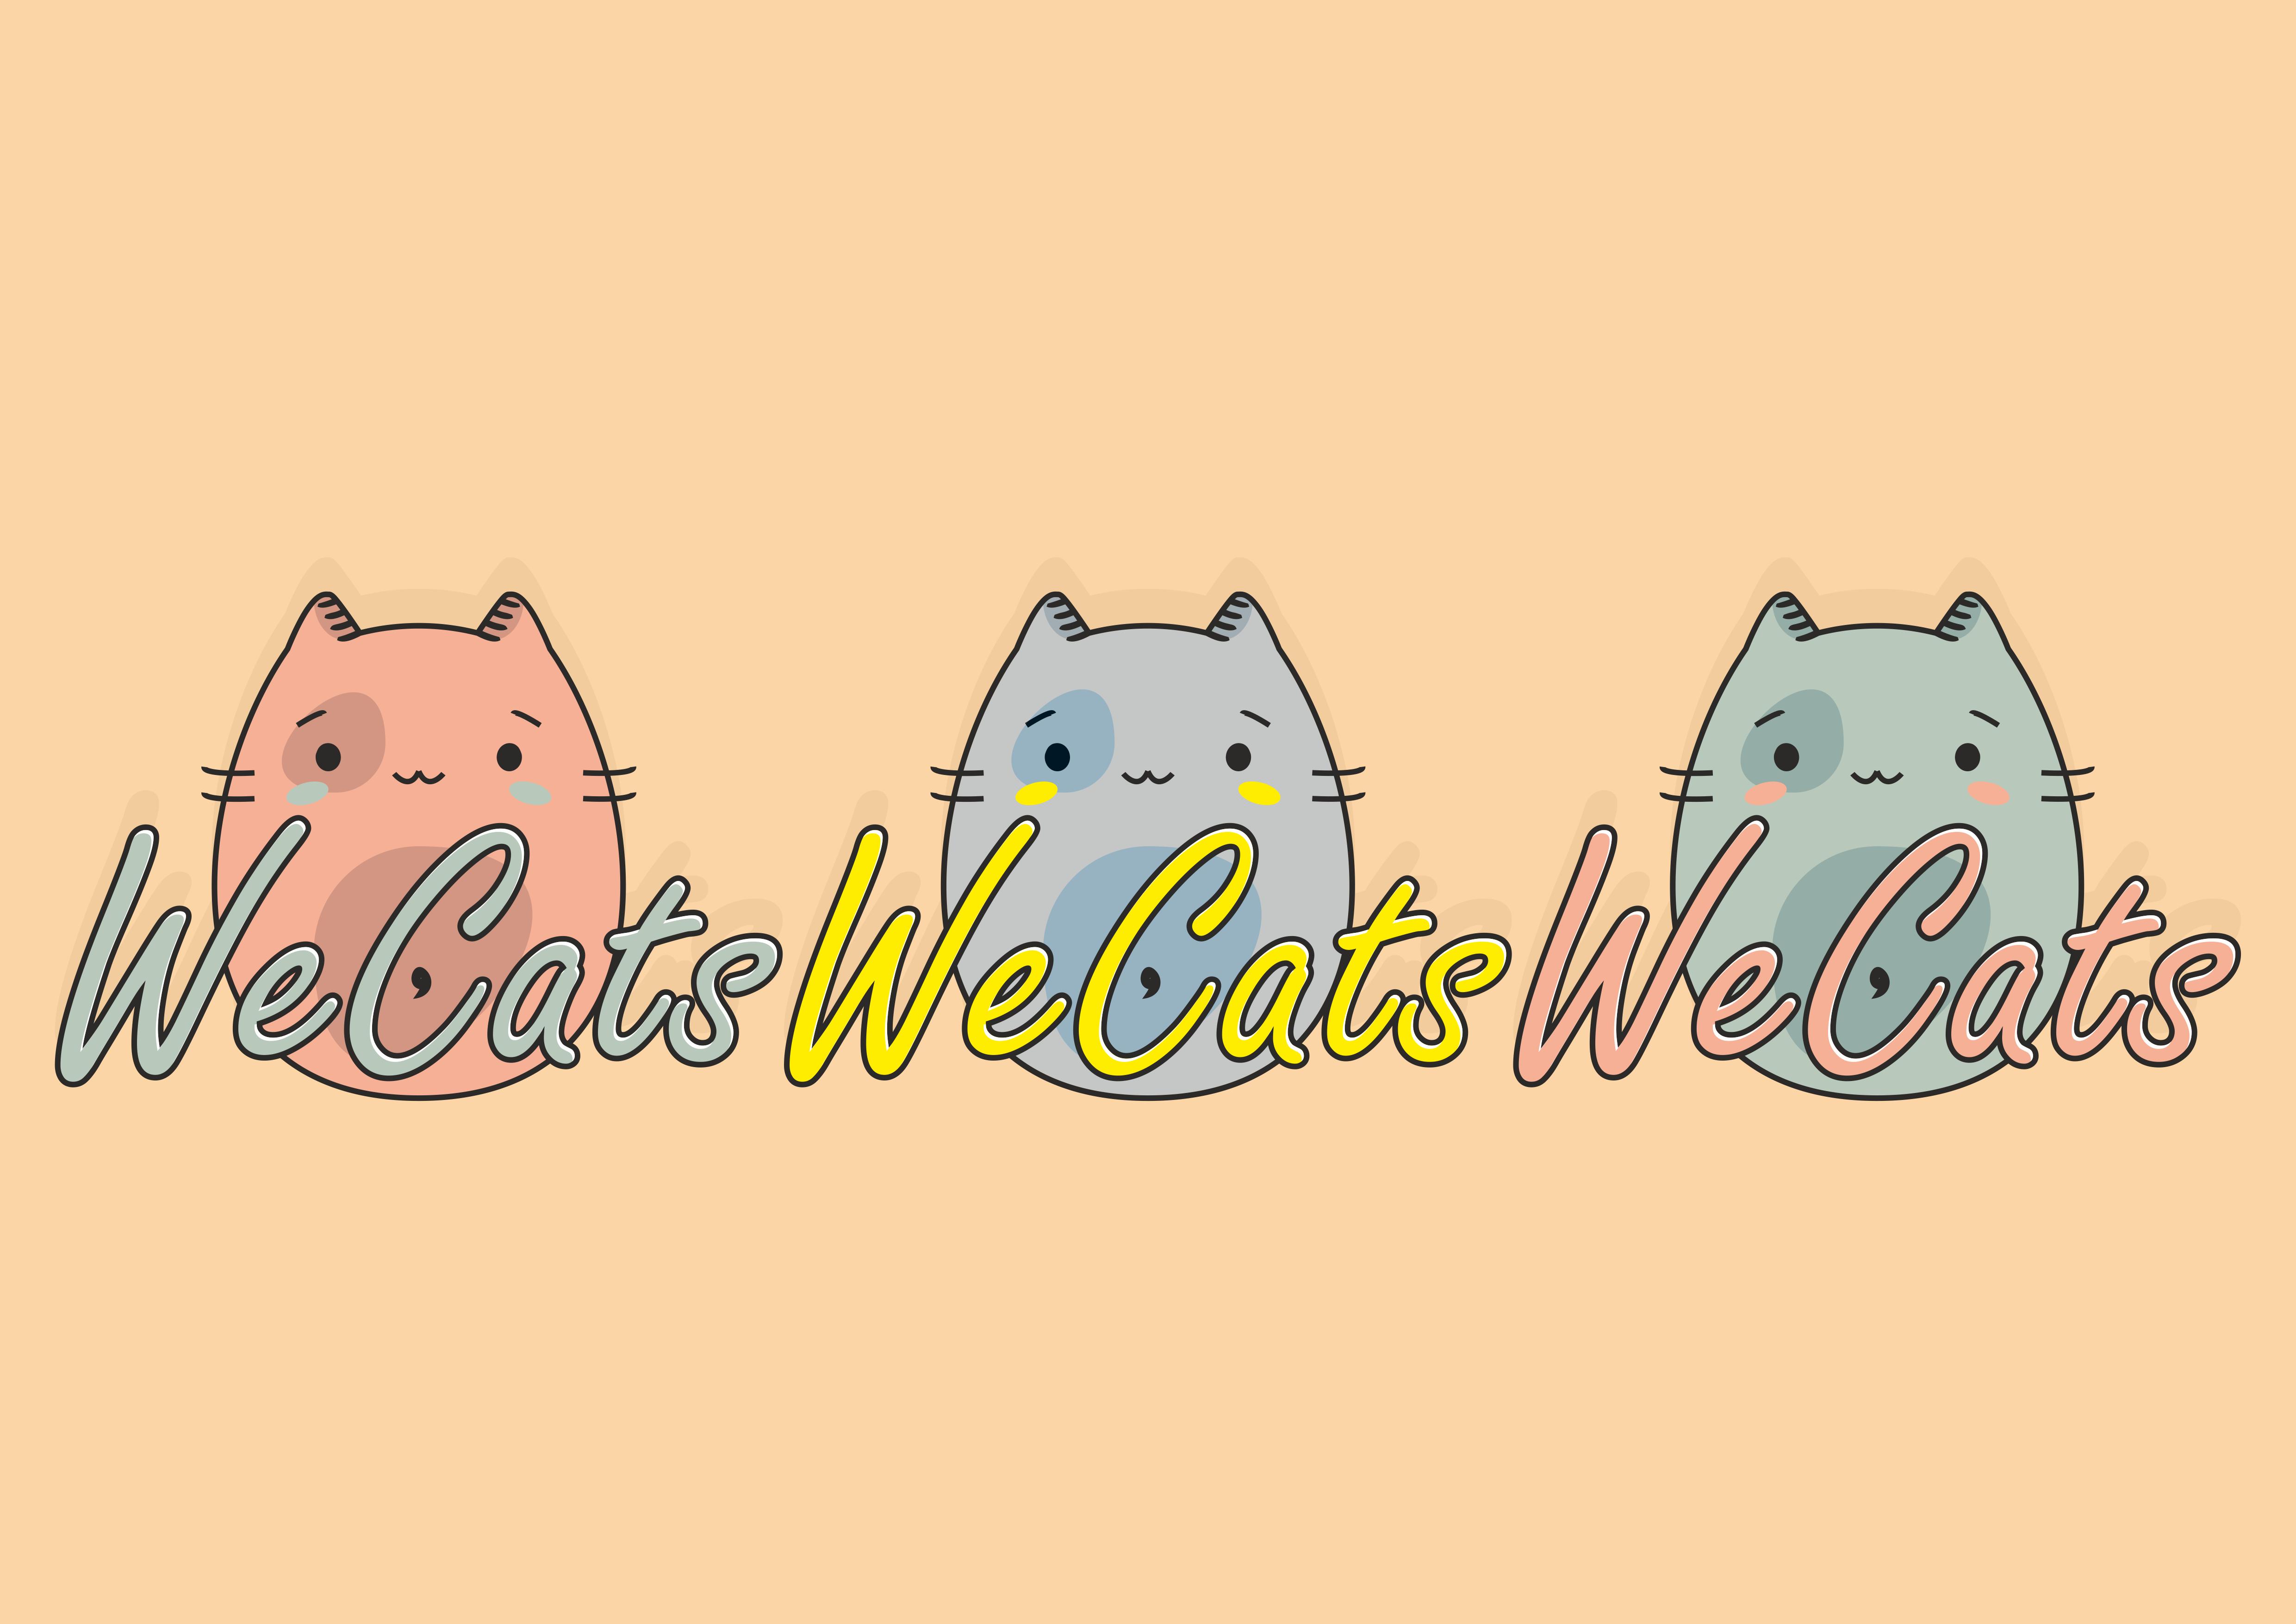 Создание логотипа WeCats фото f_0135f1a1d0e78b7a.png